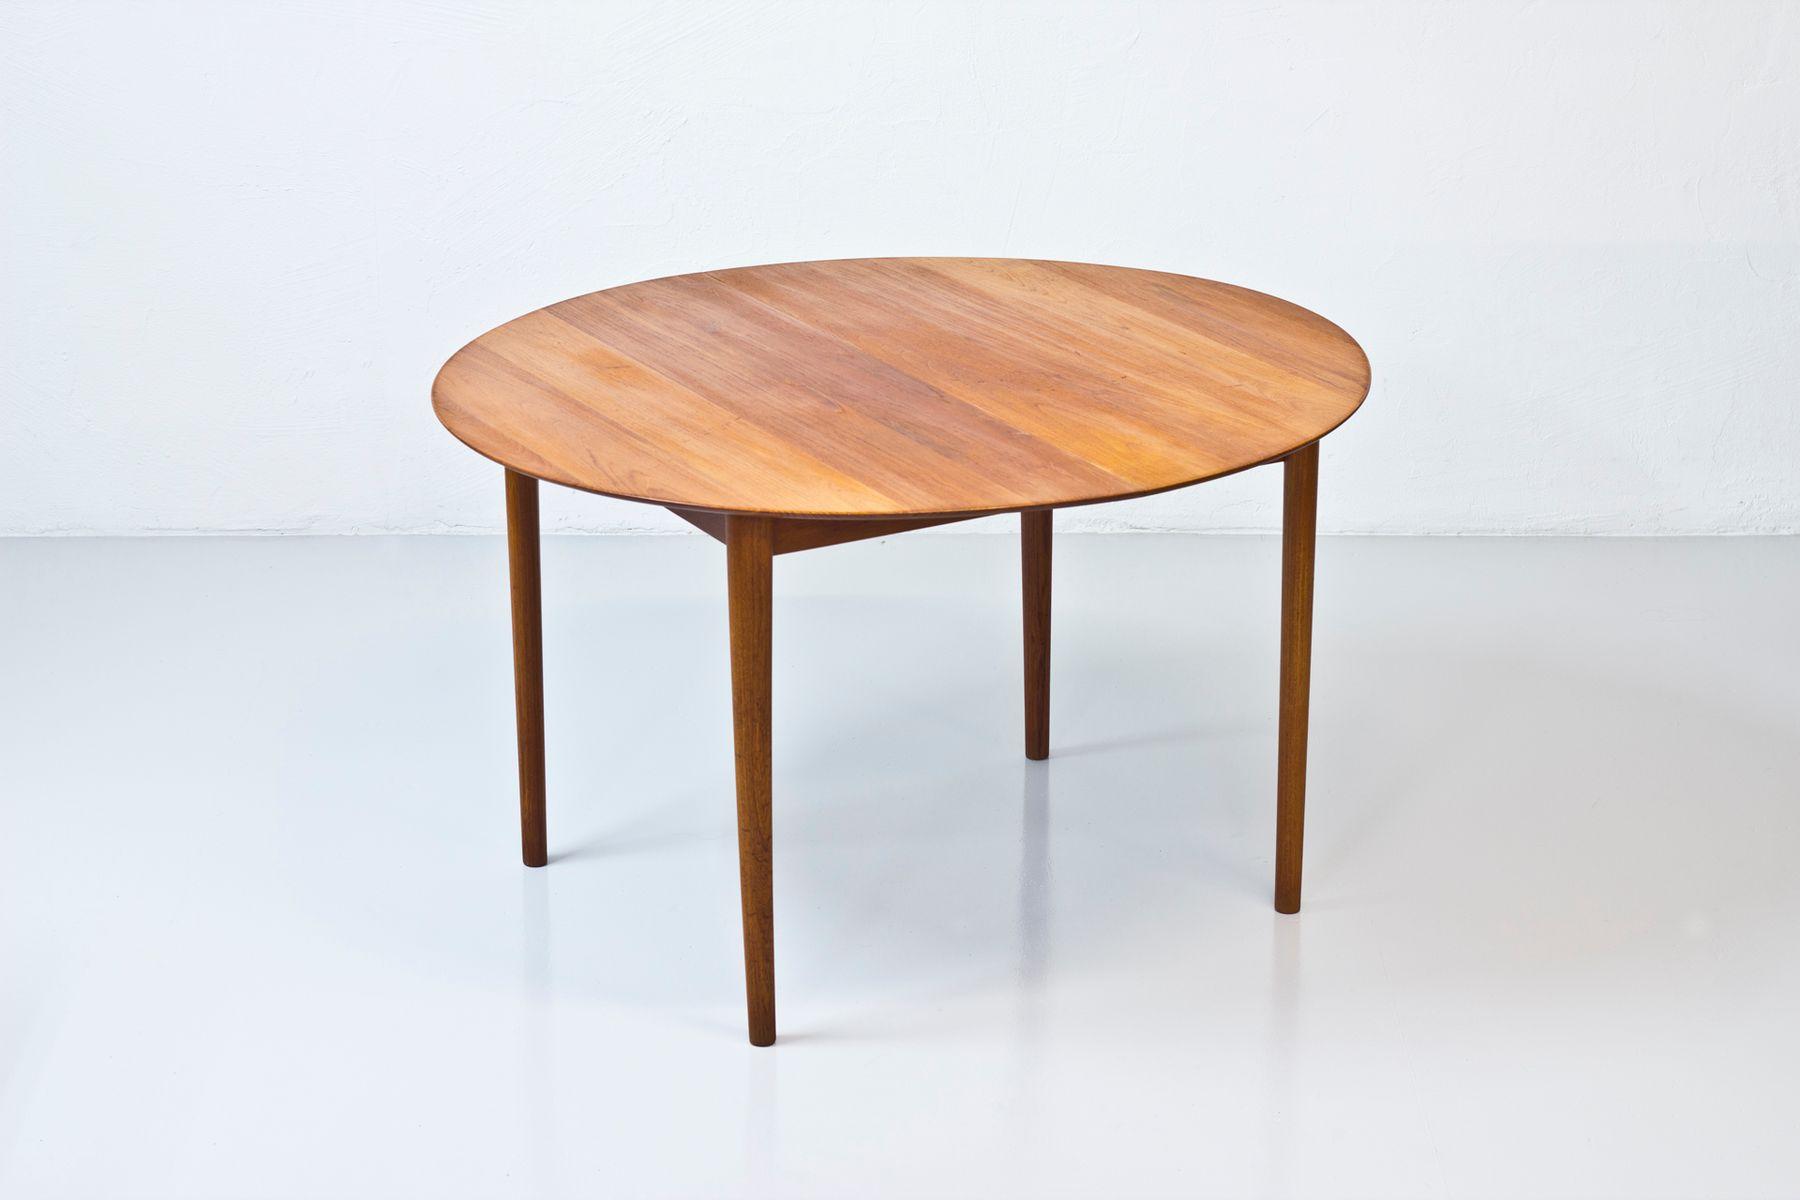 Model 311 Teak Dining Table by Peter Hvidt & Orla M¸lgaard 1950s